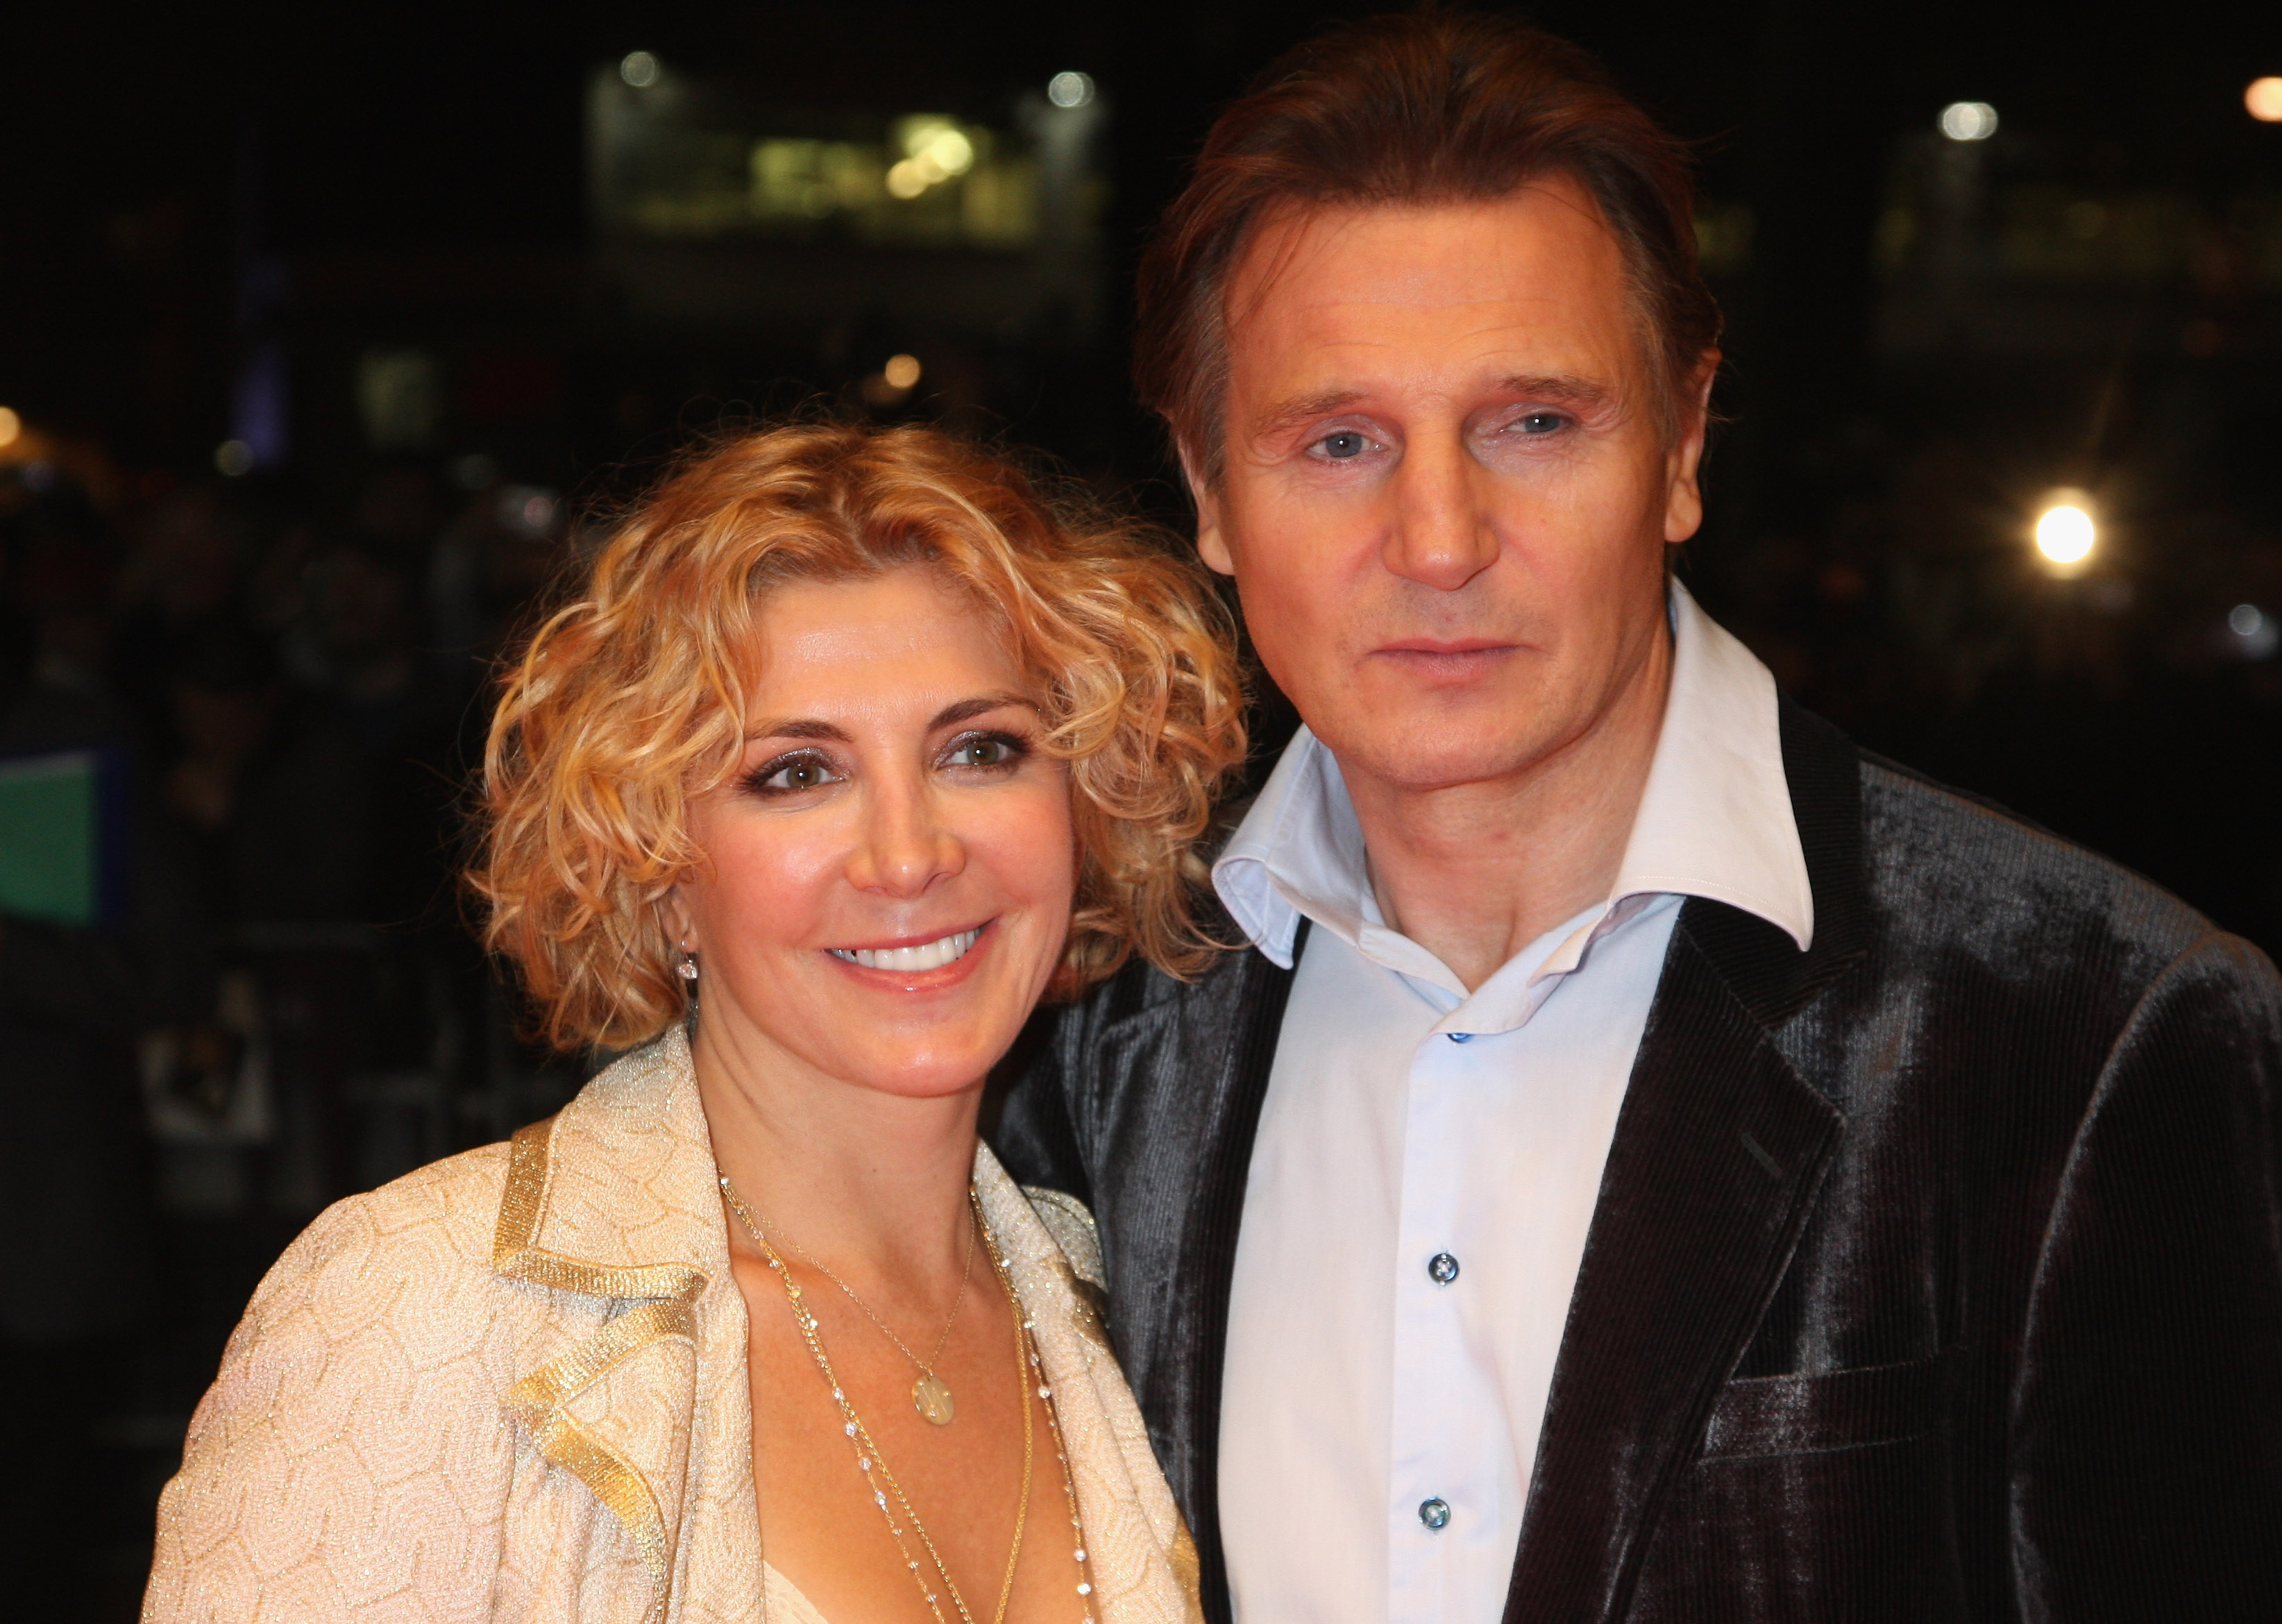 Love Actually's poignant reunion led Liam Neeson to reflect on death of wife Natasha Richardson